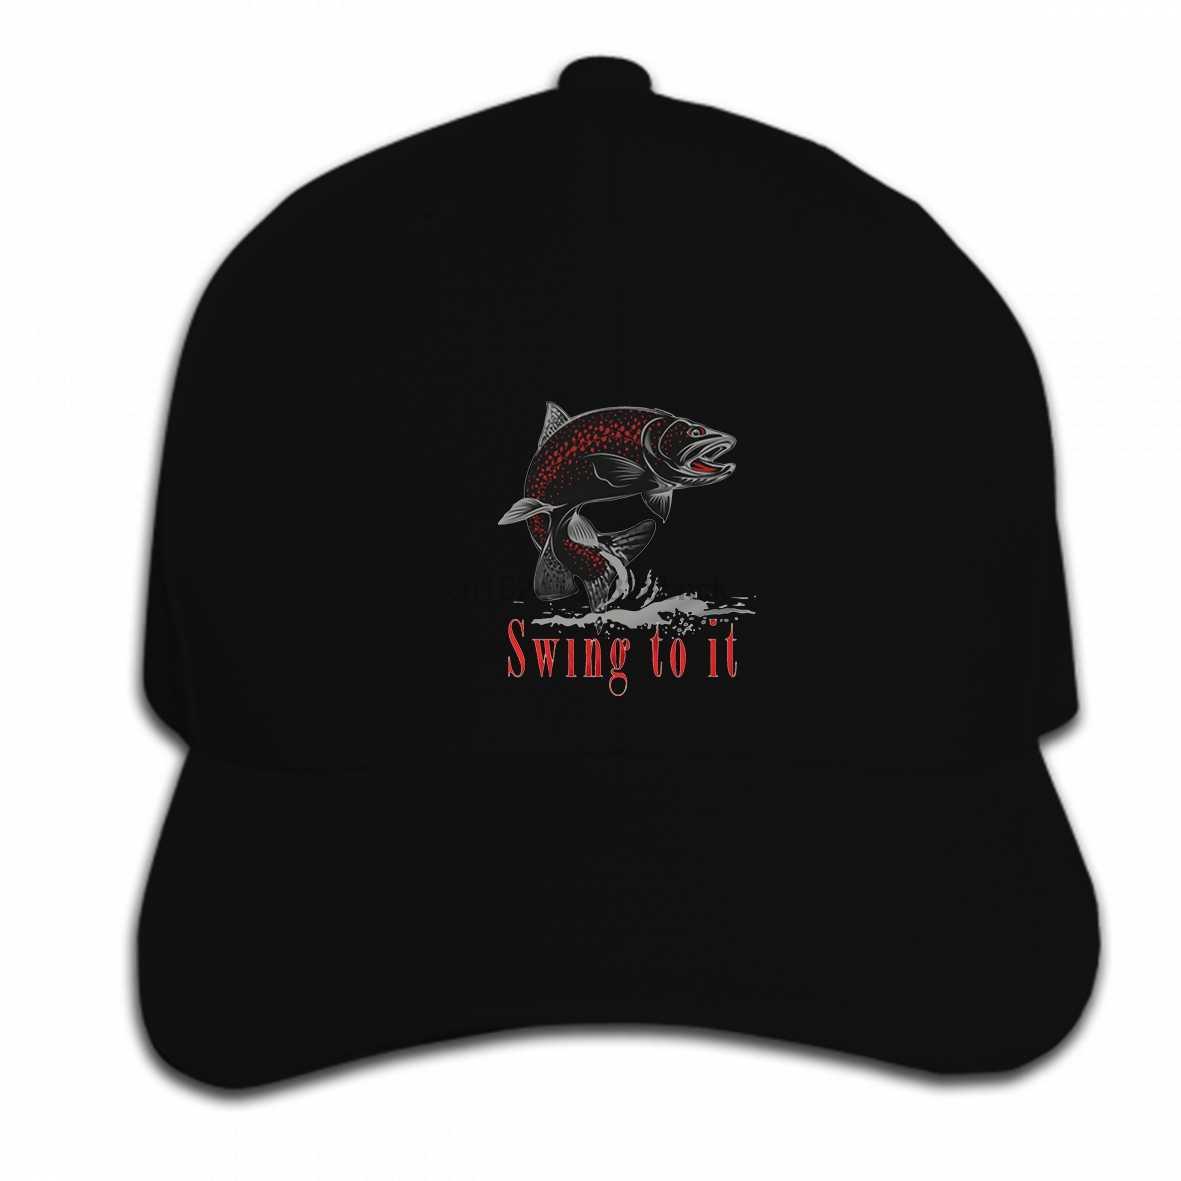 5dba3db2e2cc8 Print Custom Baseball Cap Hip Hop Fly fishing salmon steelhead trout brook  spey switch rod Alaska